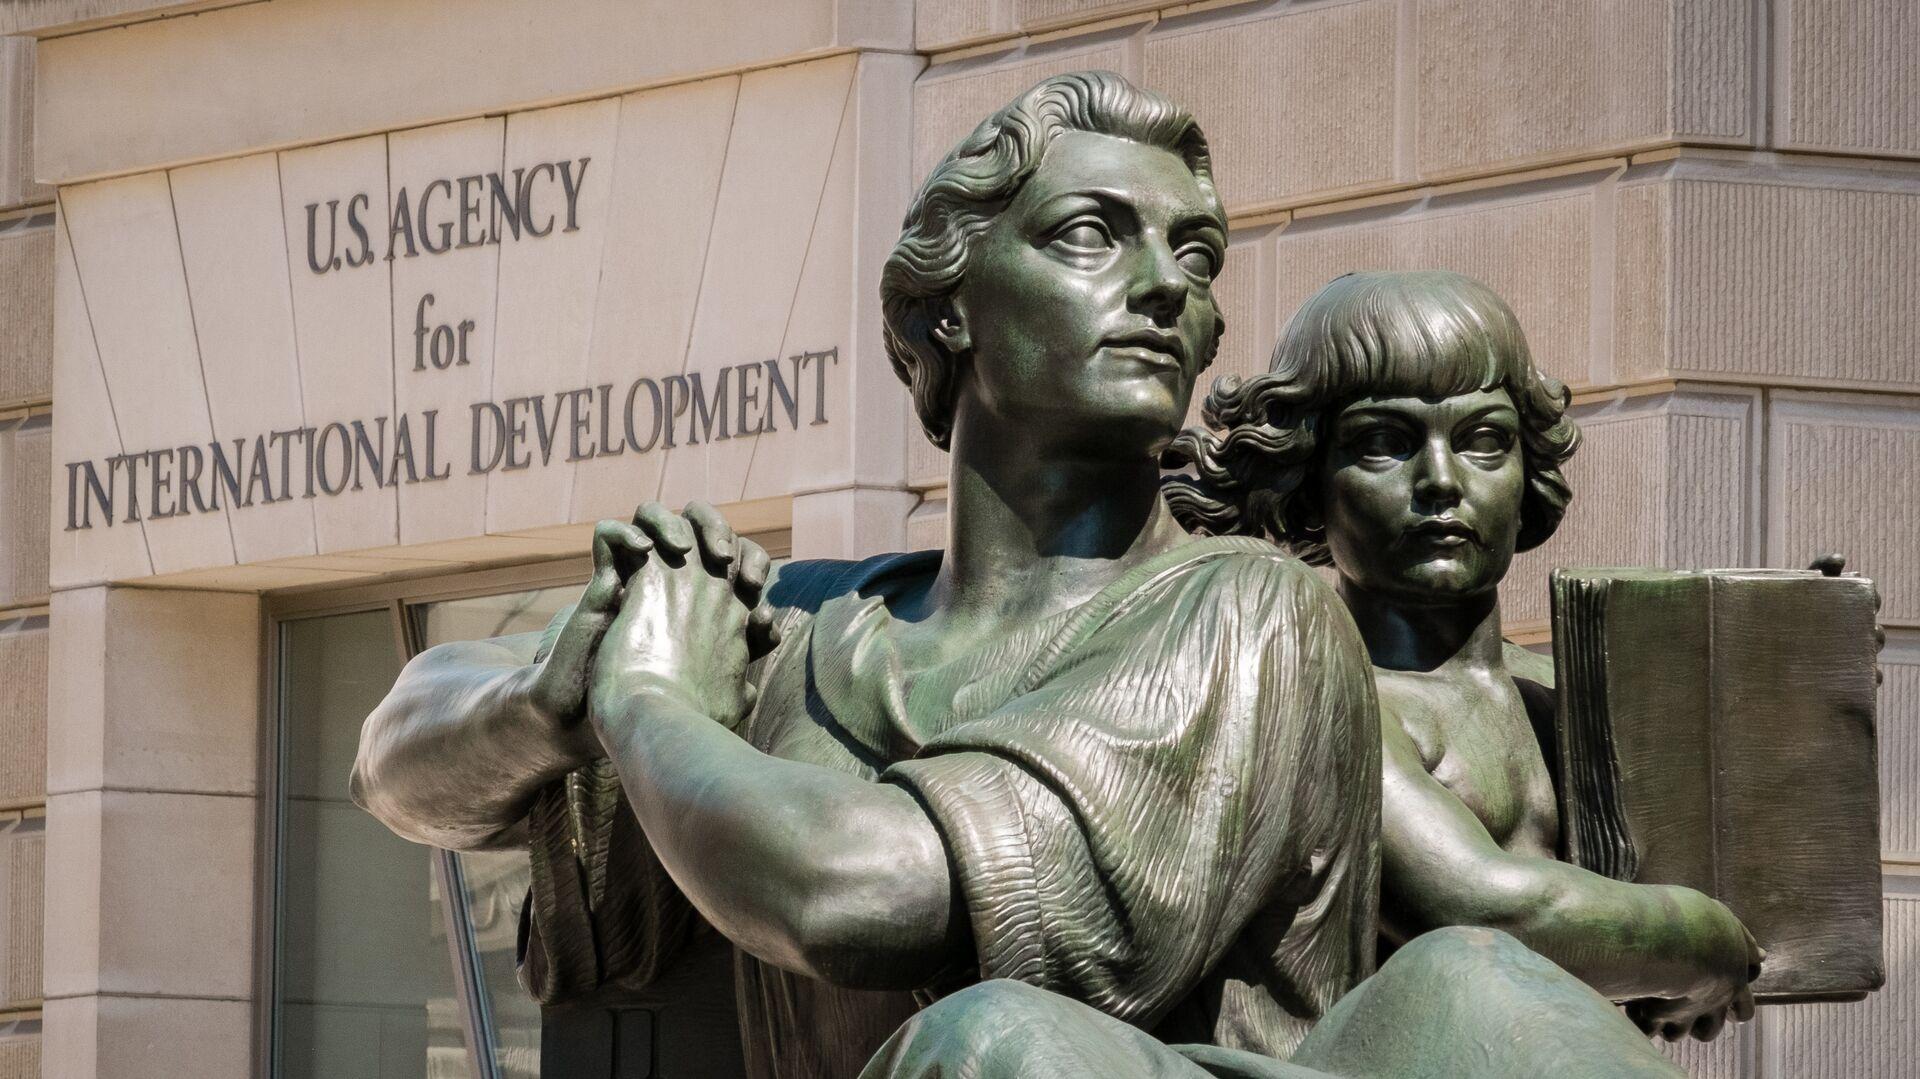 Штаб-квартира Агентства США по международному развитию в Вашингтоне - РИА Новости, 1920, 20.11.2020